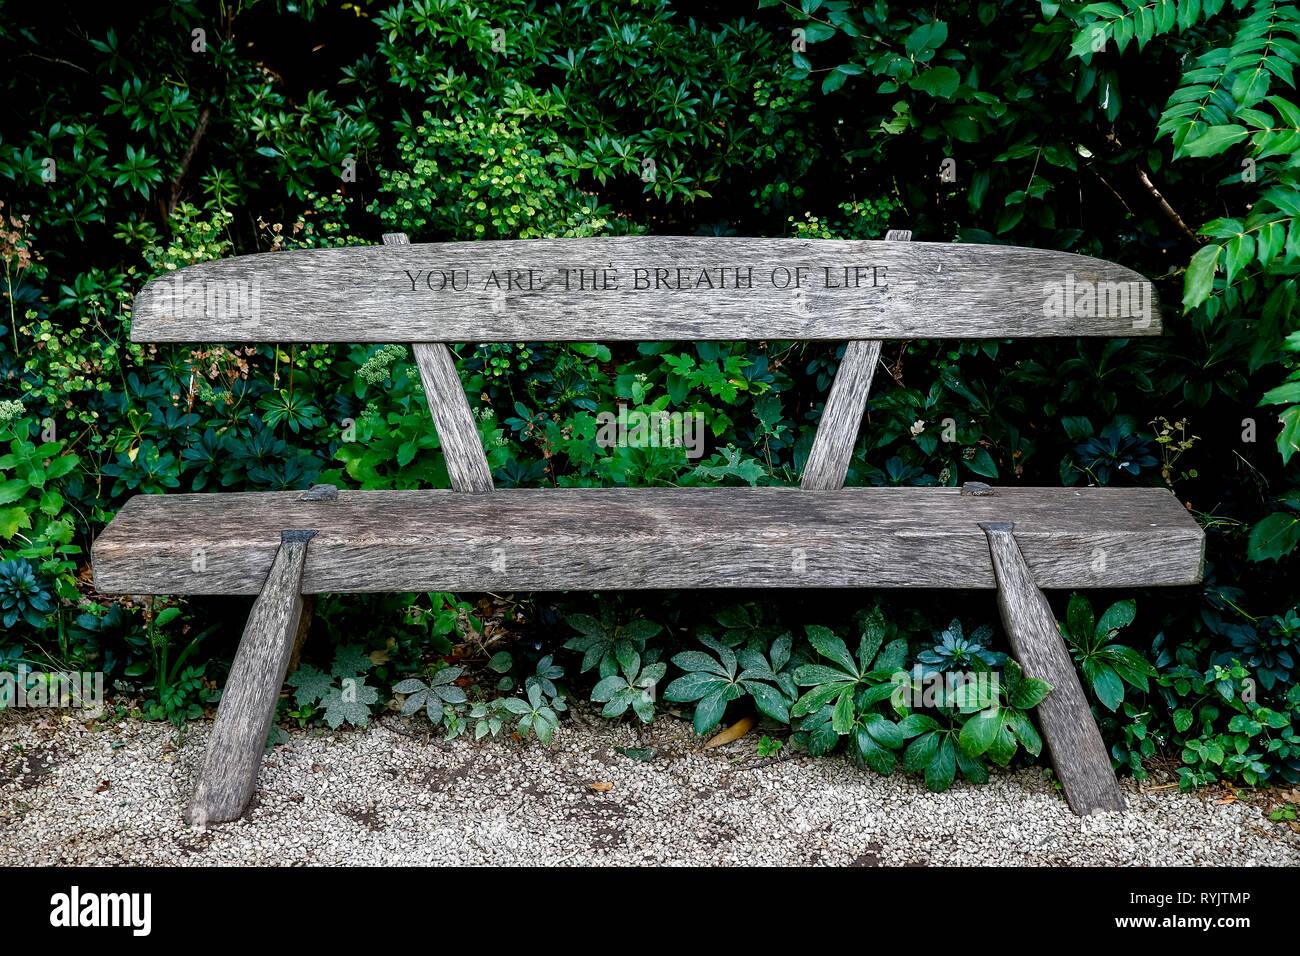 The George Harrison garden, Bhaktivedanta manor, Watford, U.K. - Stock Image